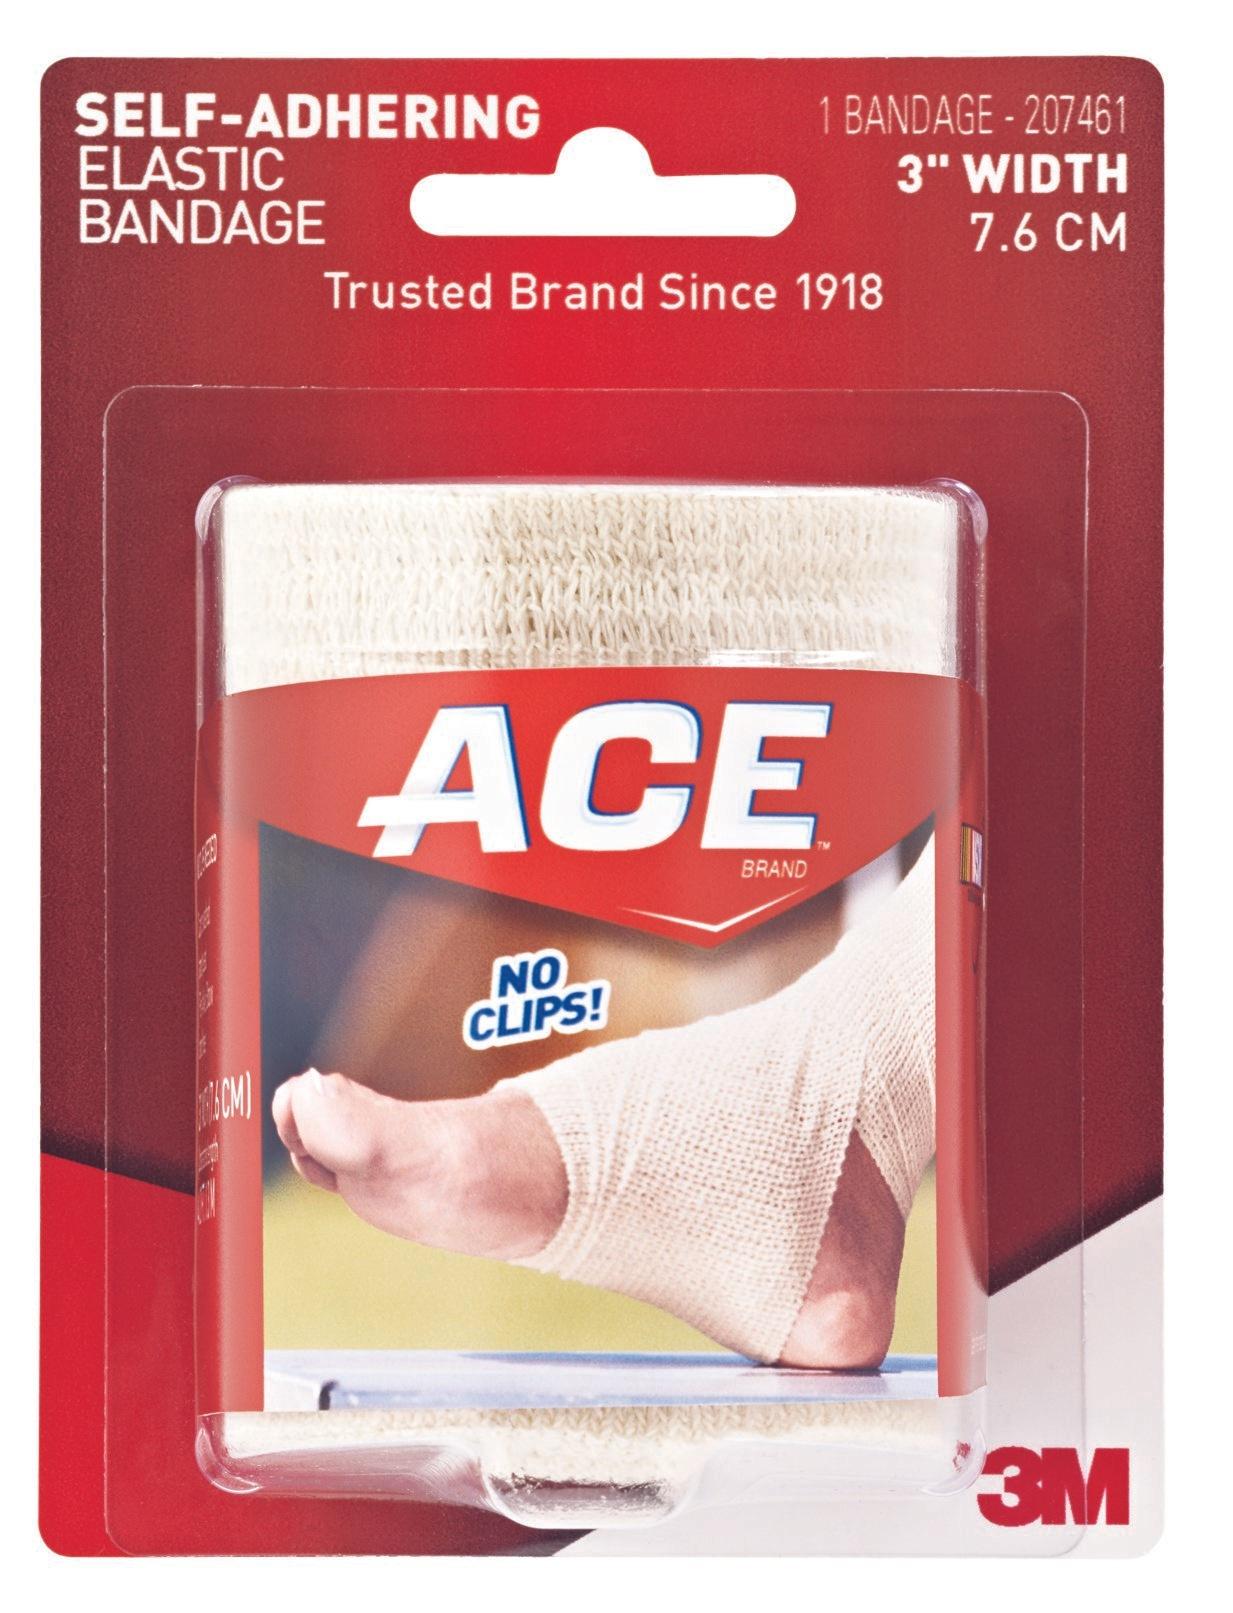 "3M ACE Self-Adhering Foot Compression Elastic Bandages, 207461, 3"" X 5' - Box of 3"